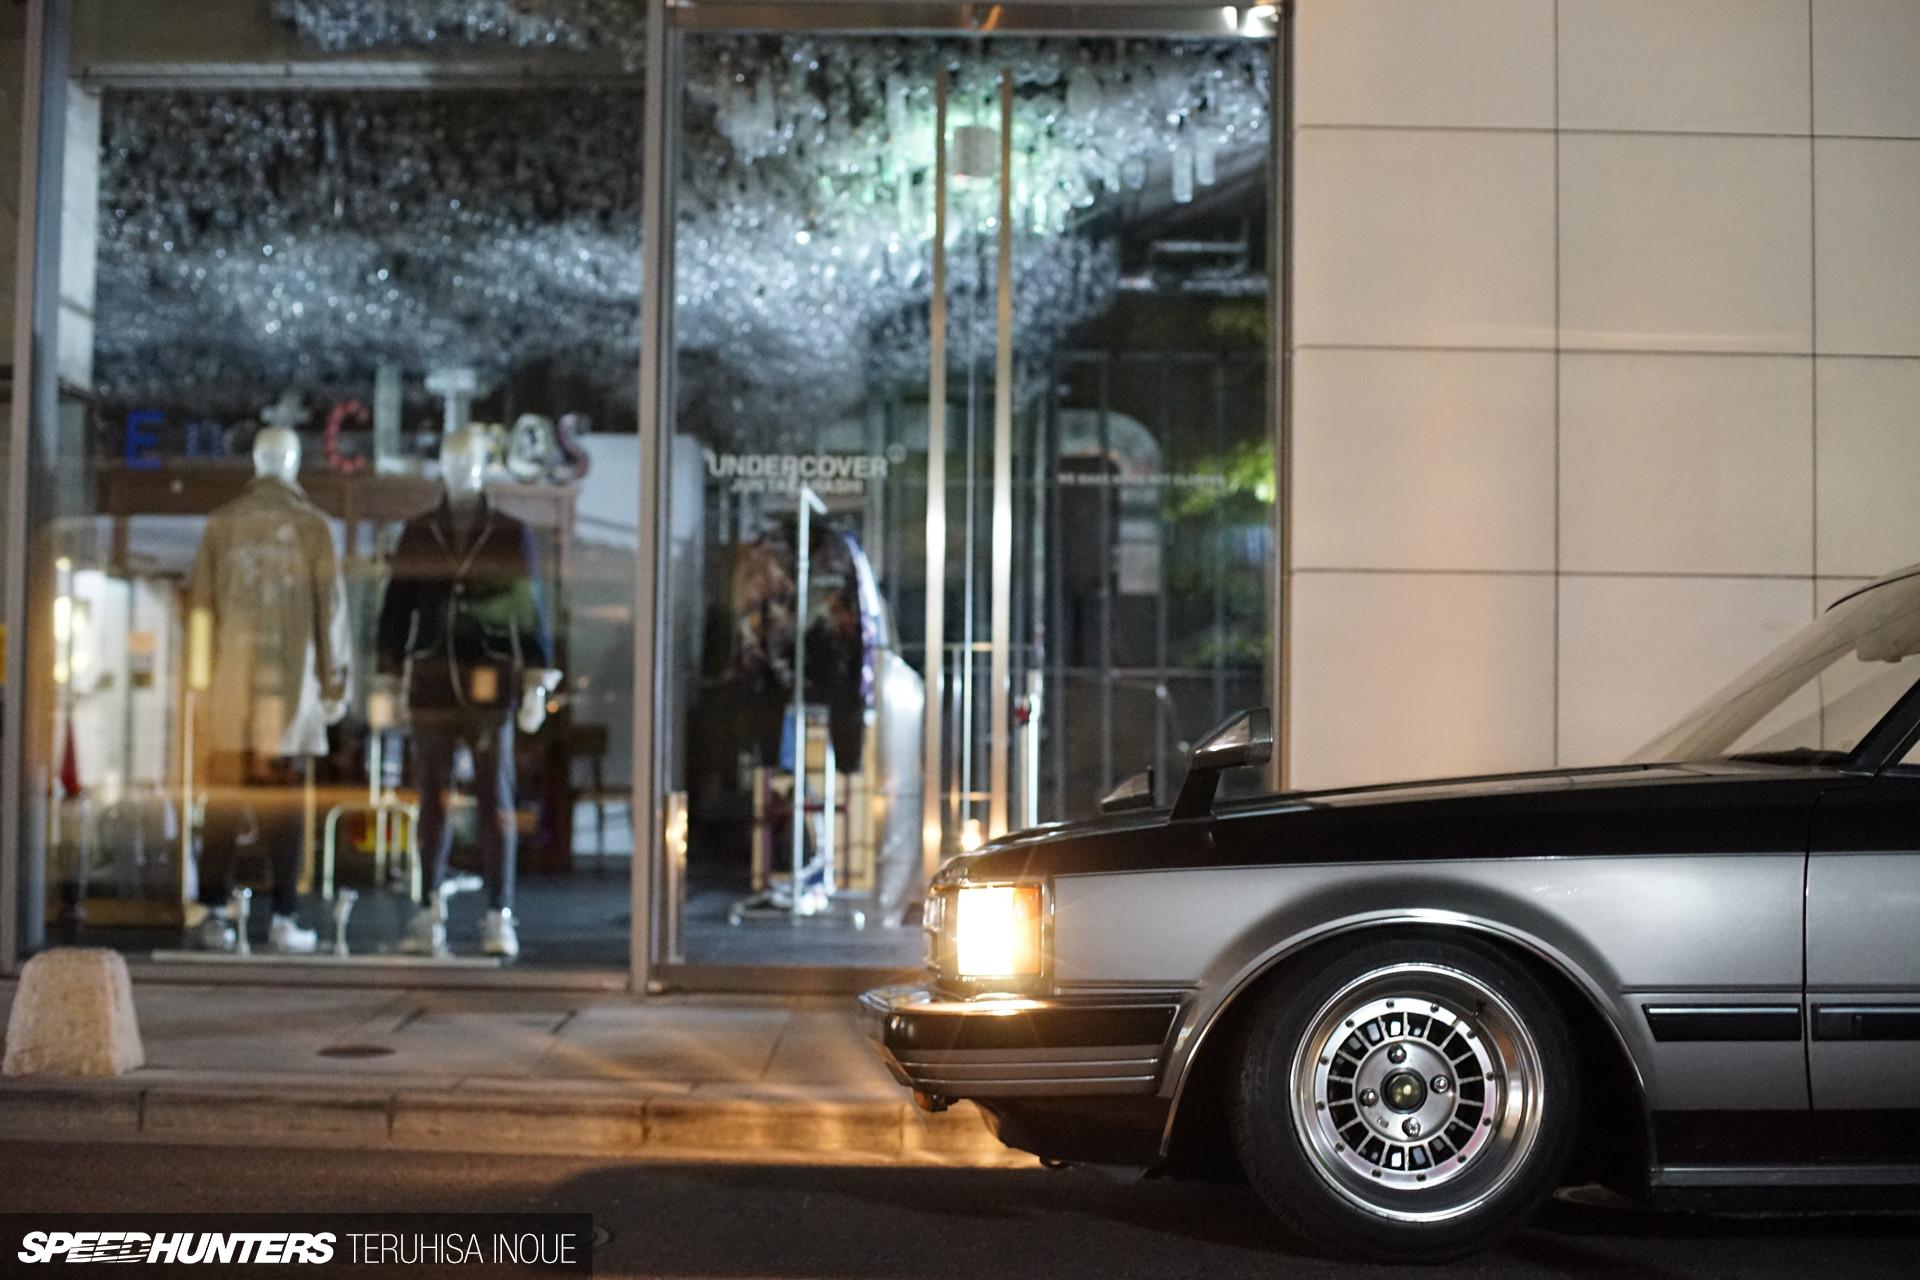 Hokkaido Style: A GX61 Cresta InTokyo